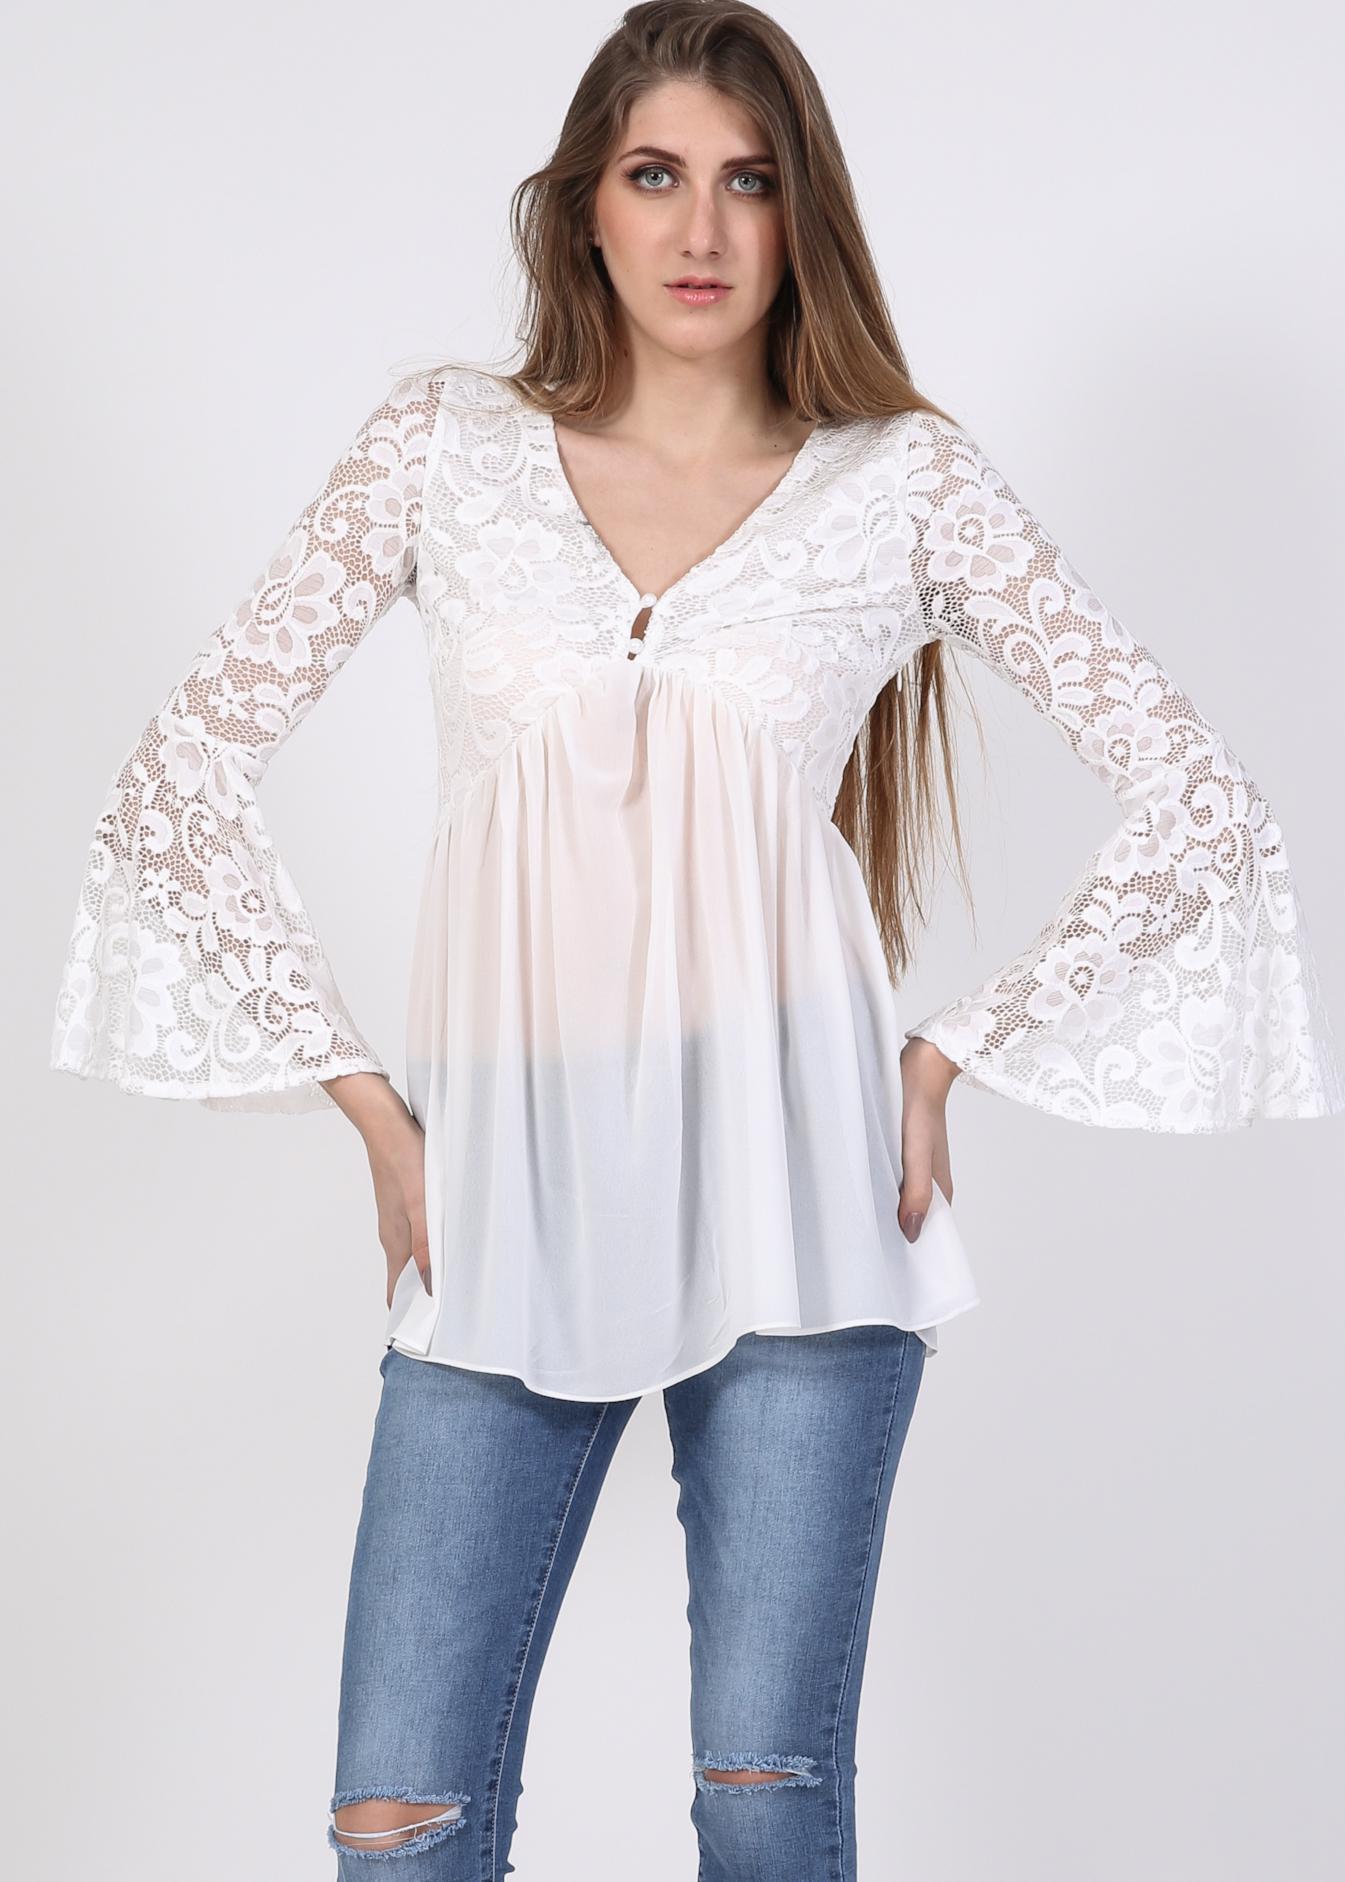 Rossie flared sleeve lace μπλούζα, λευκό ρούχα